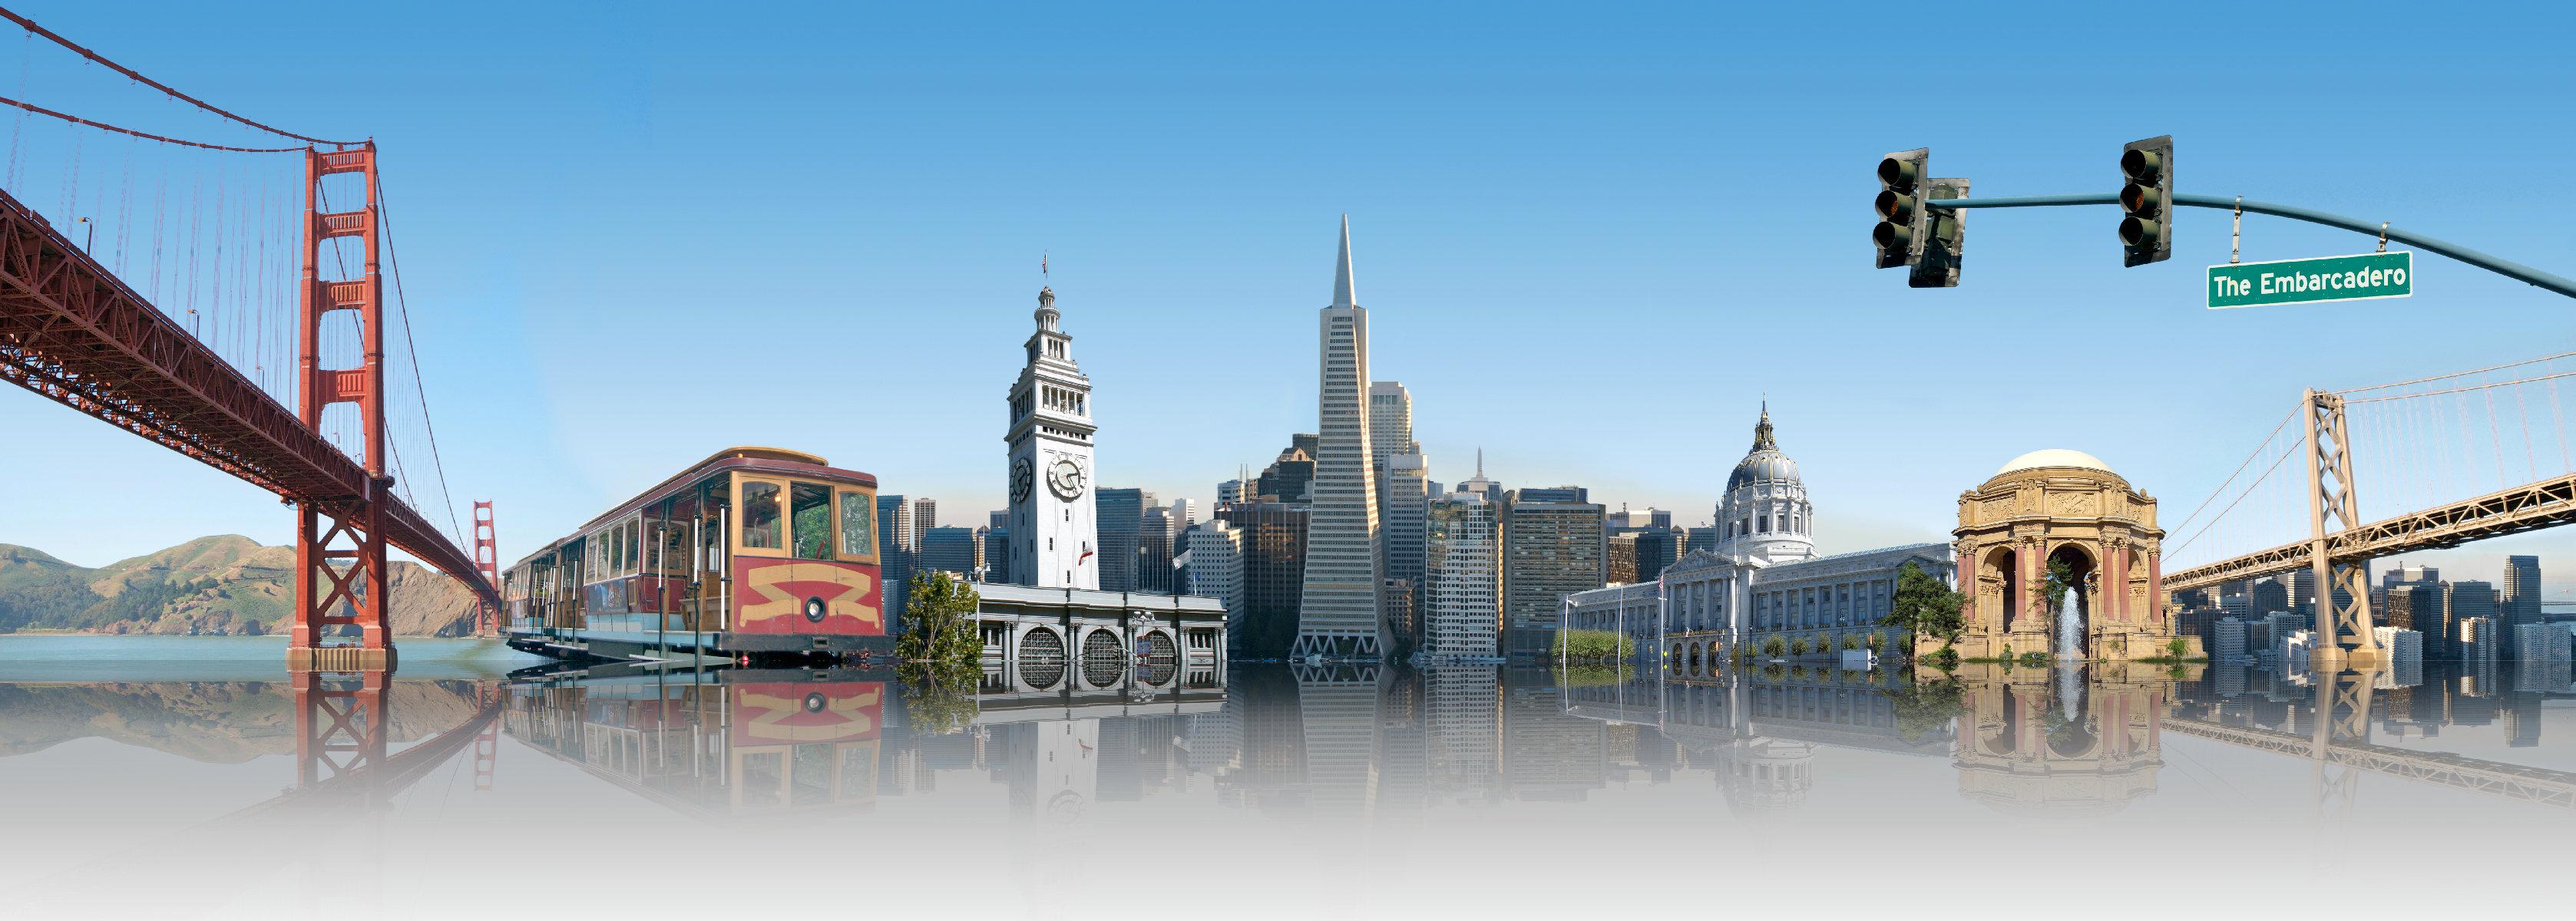 Pontos turísticos de San Francisco